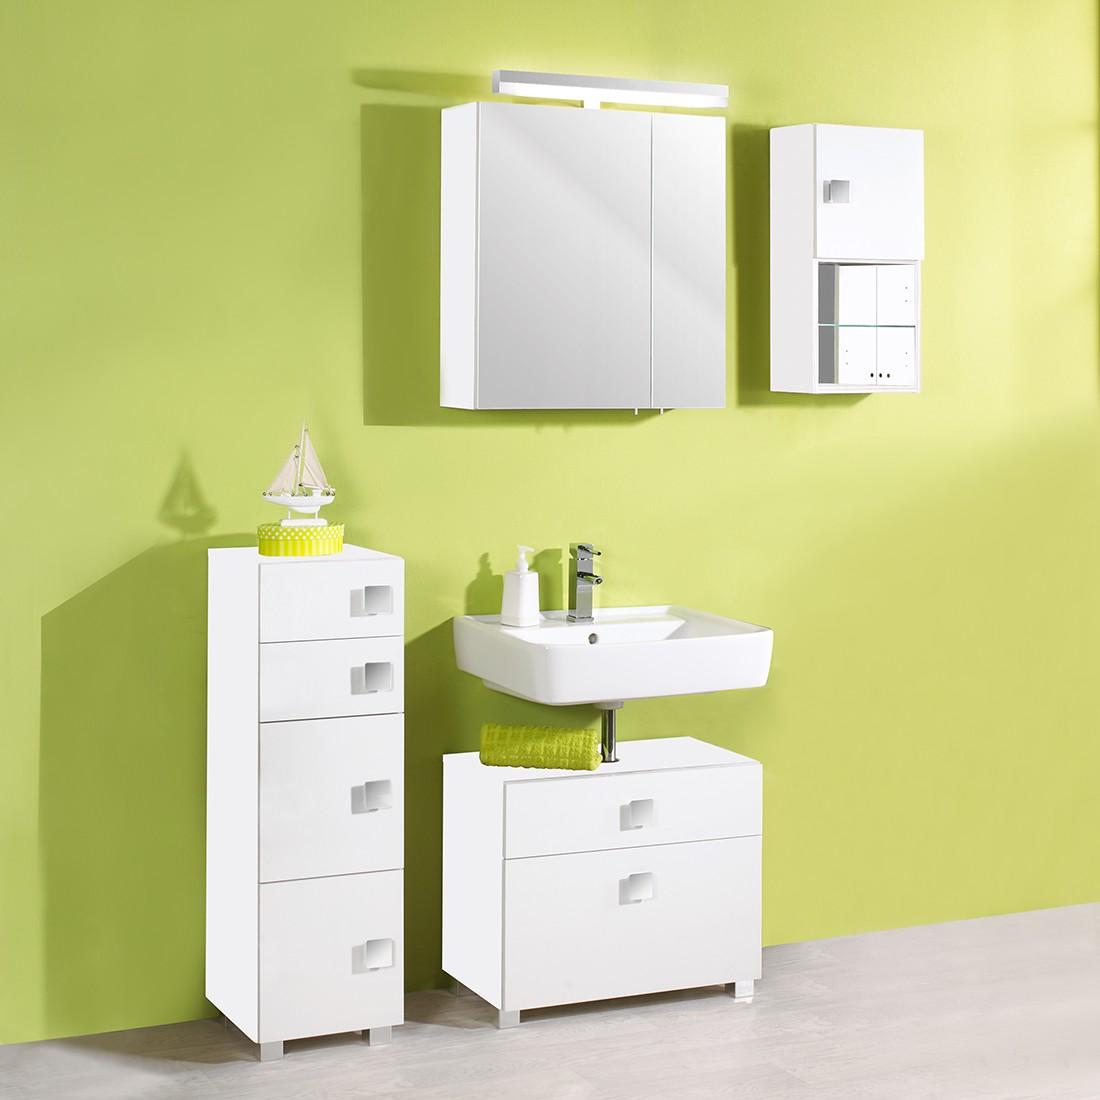 Set Da Bagno Moderno : Offerte mobile bagno moderno mobili bagno prezzi offerte mobile